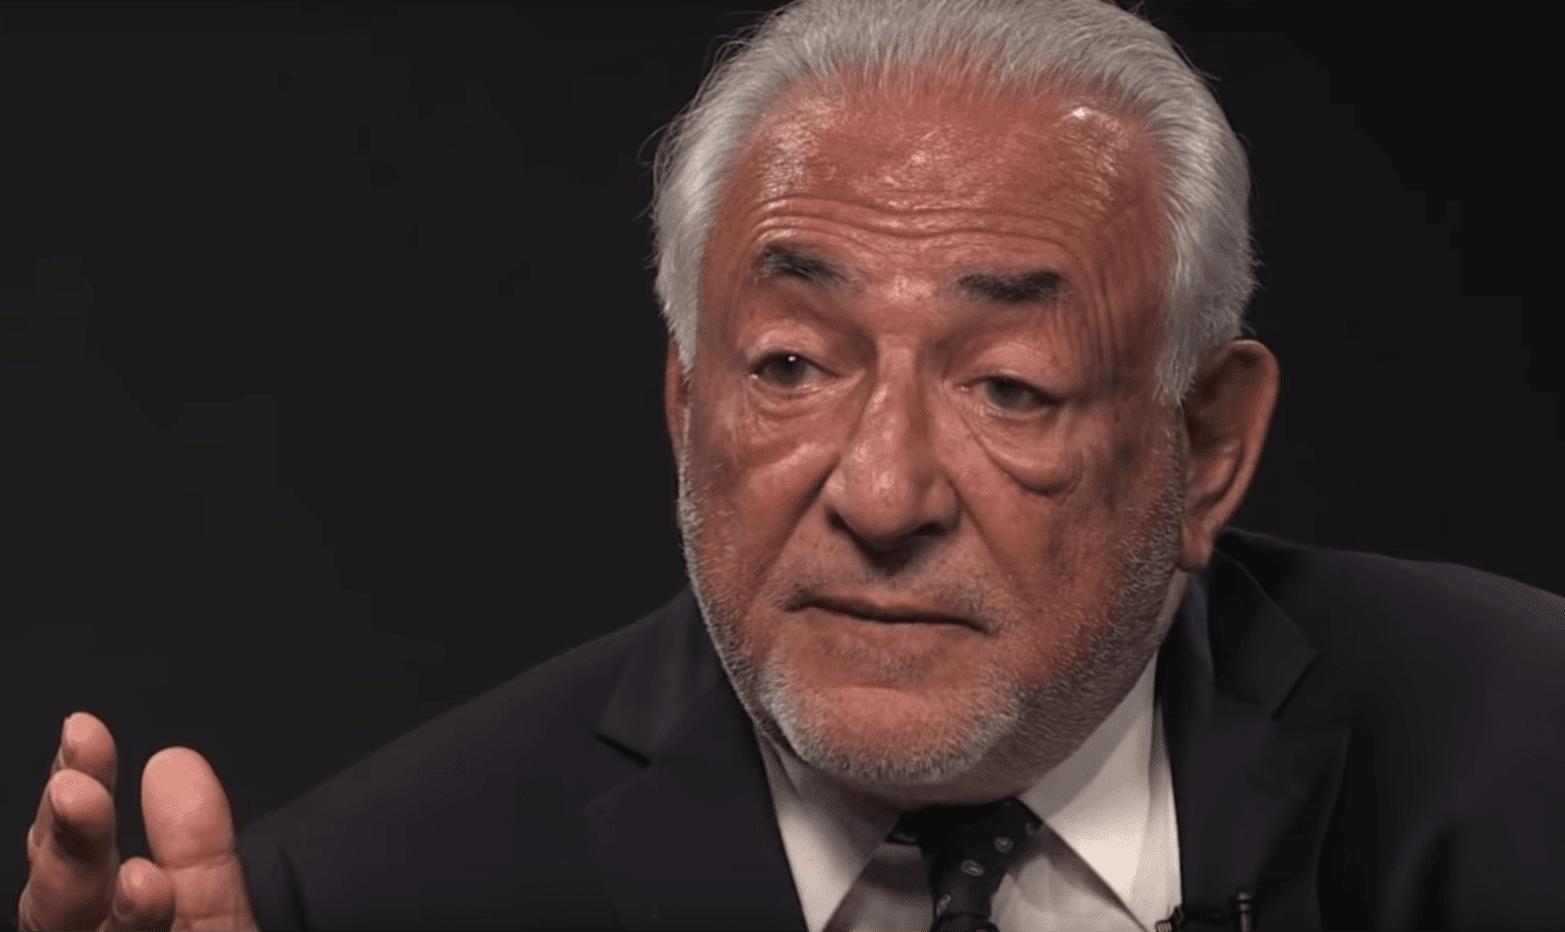 Dominique Strauss-Kahn dira sa vérité dans un film en 2021